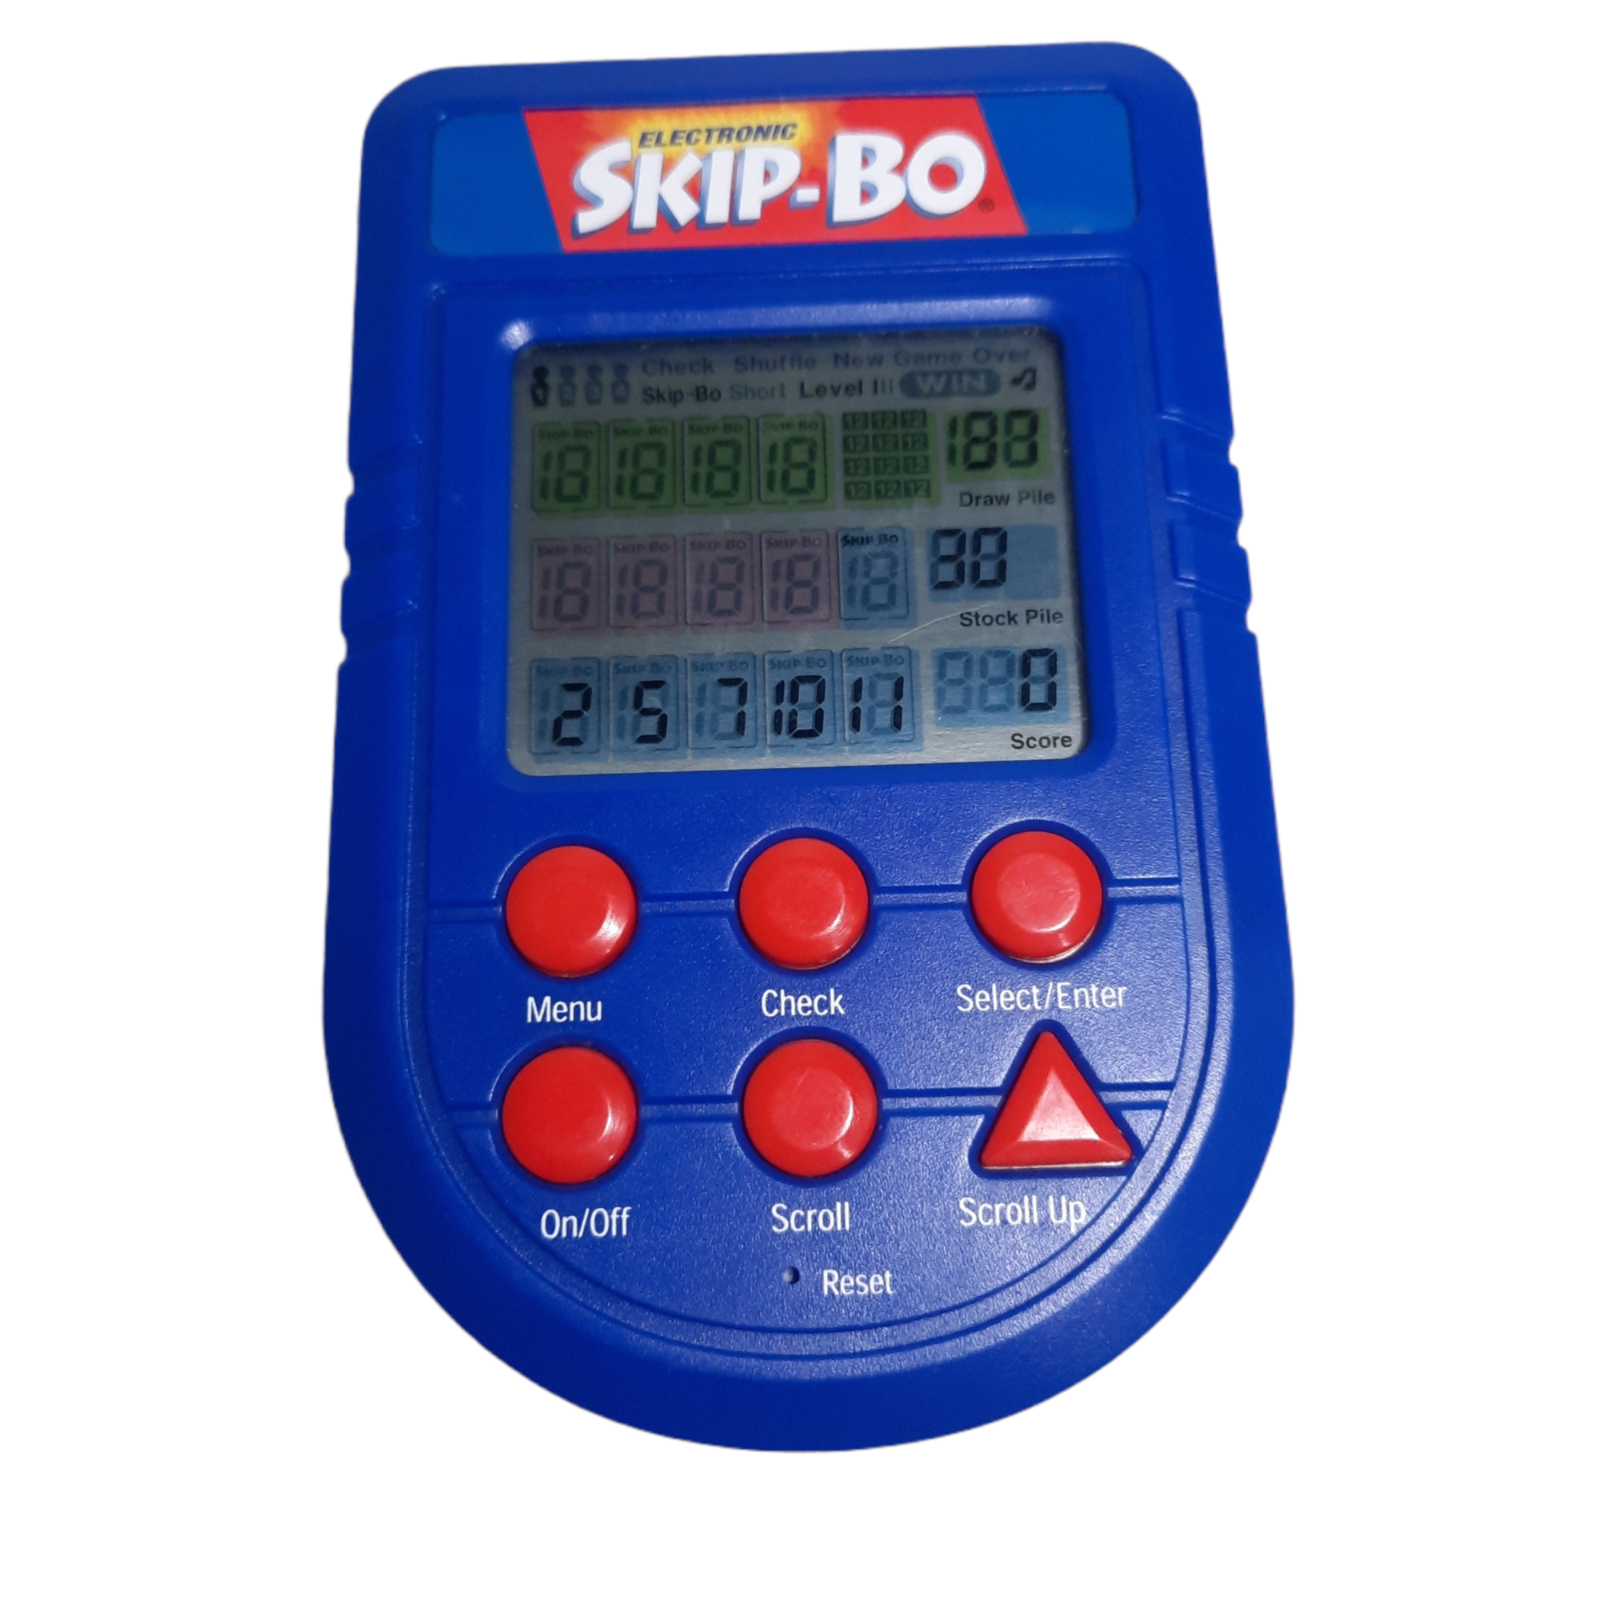 Electronic Skip-Bo Handheld card Game Mattel 2002 Tested WORKS w/ Batteries  - $28.77